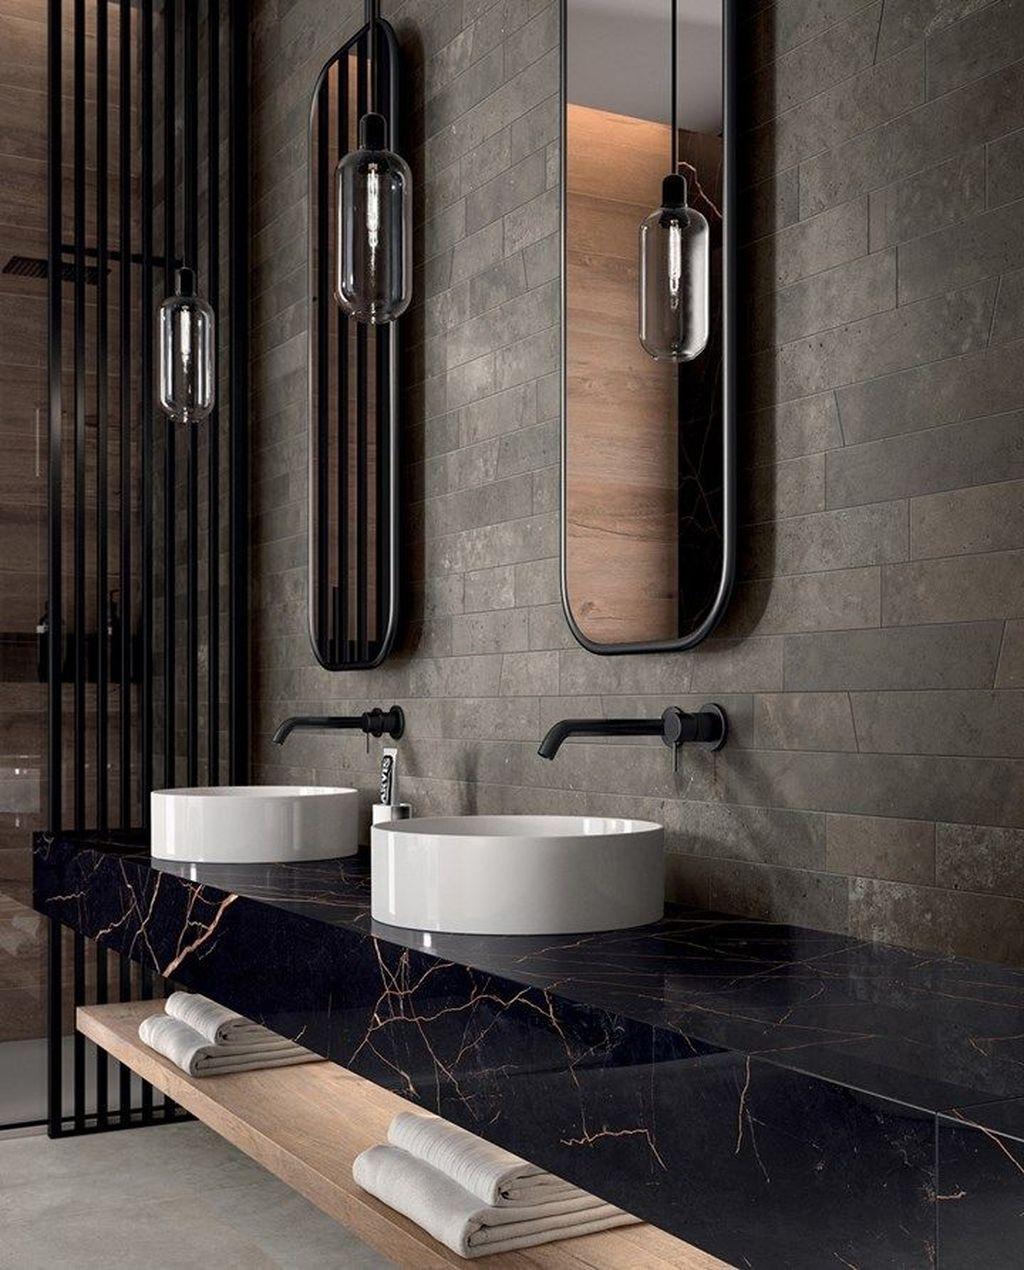 Beautiful Contemporary Interior Design Ideas You Never Seen Before 15